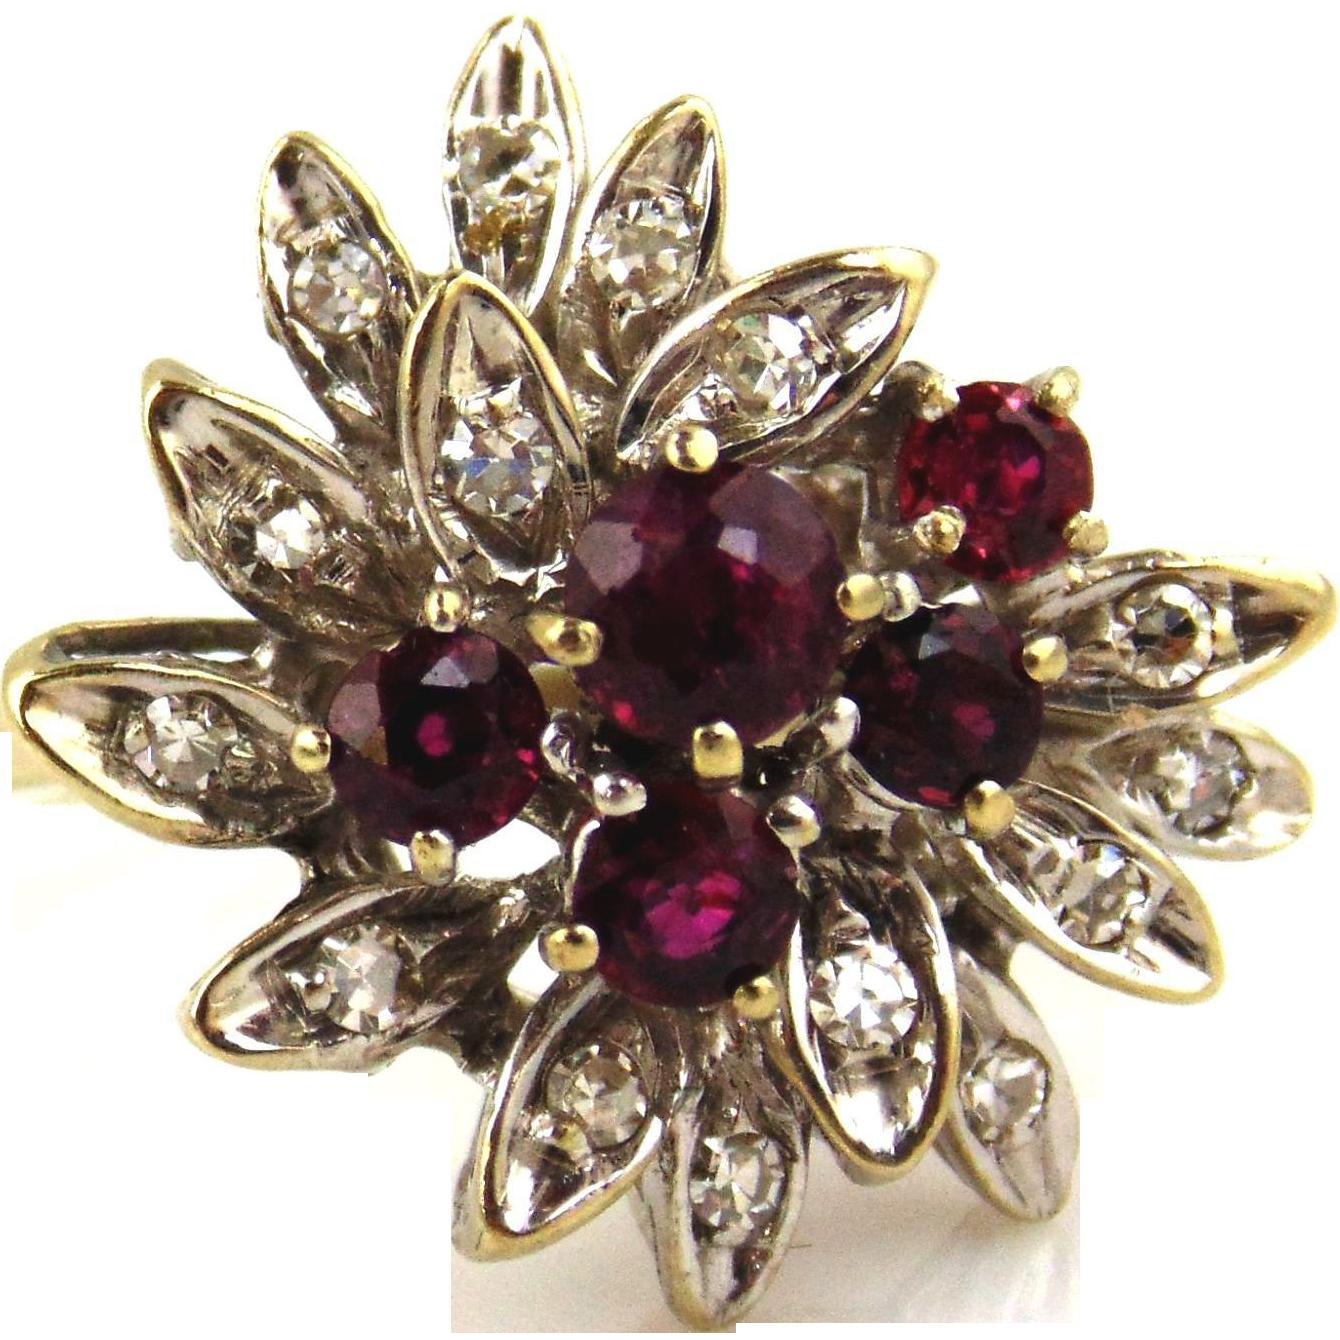 Ruby & Diamond Ring 18kt White Gold Cocktail Ring